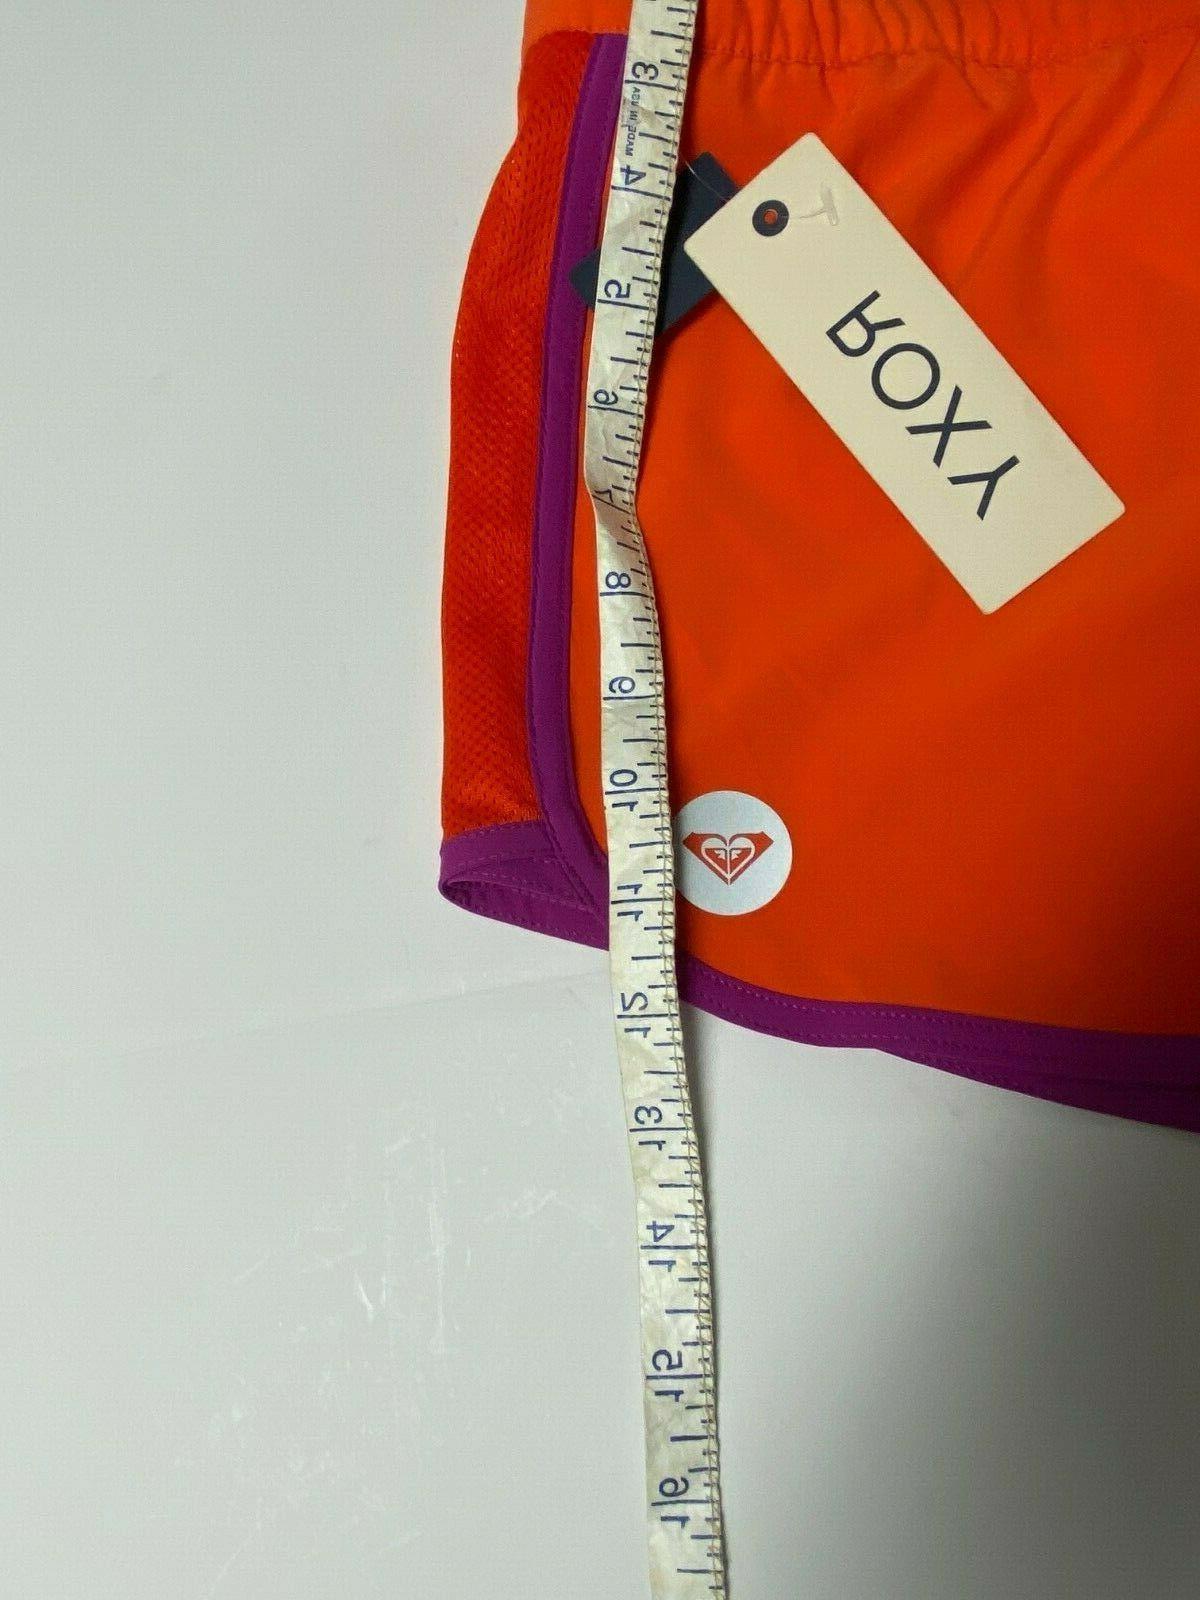 Shorts Size Orange Mesh Panels Brief Liner